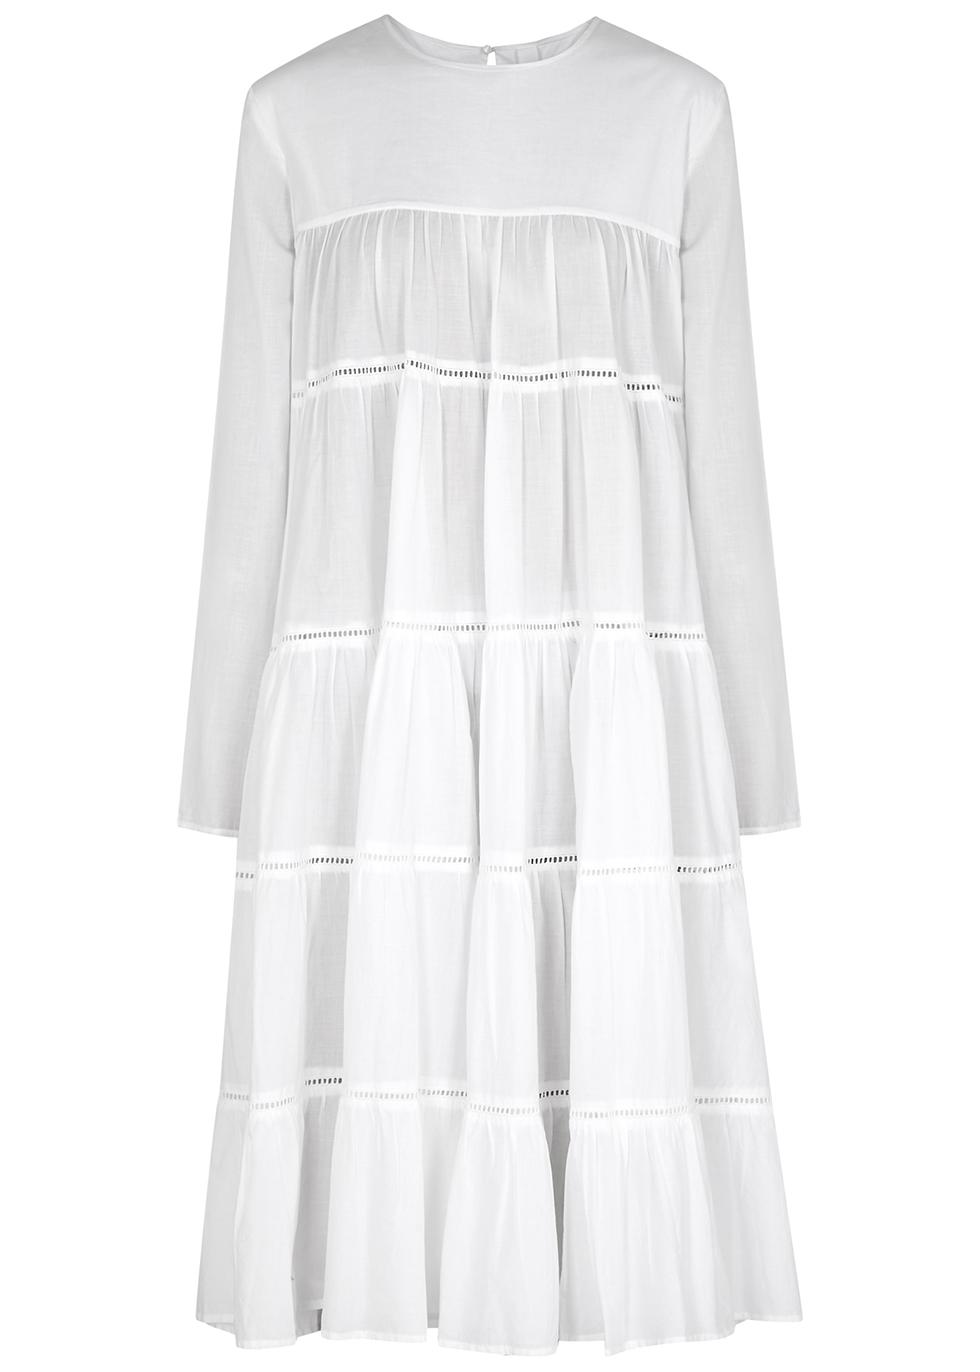 Essaouira white tiered cotton midi dress